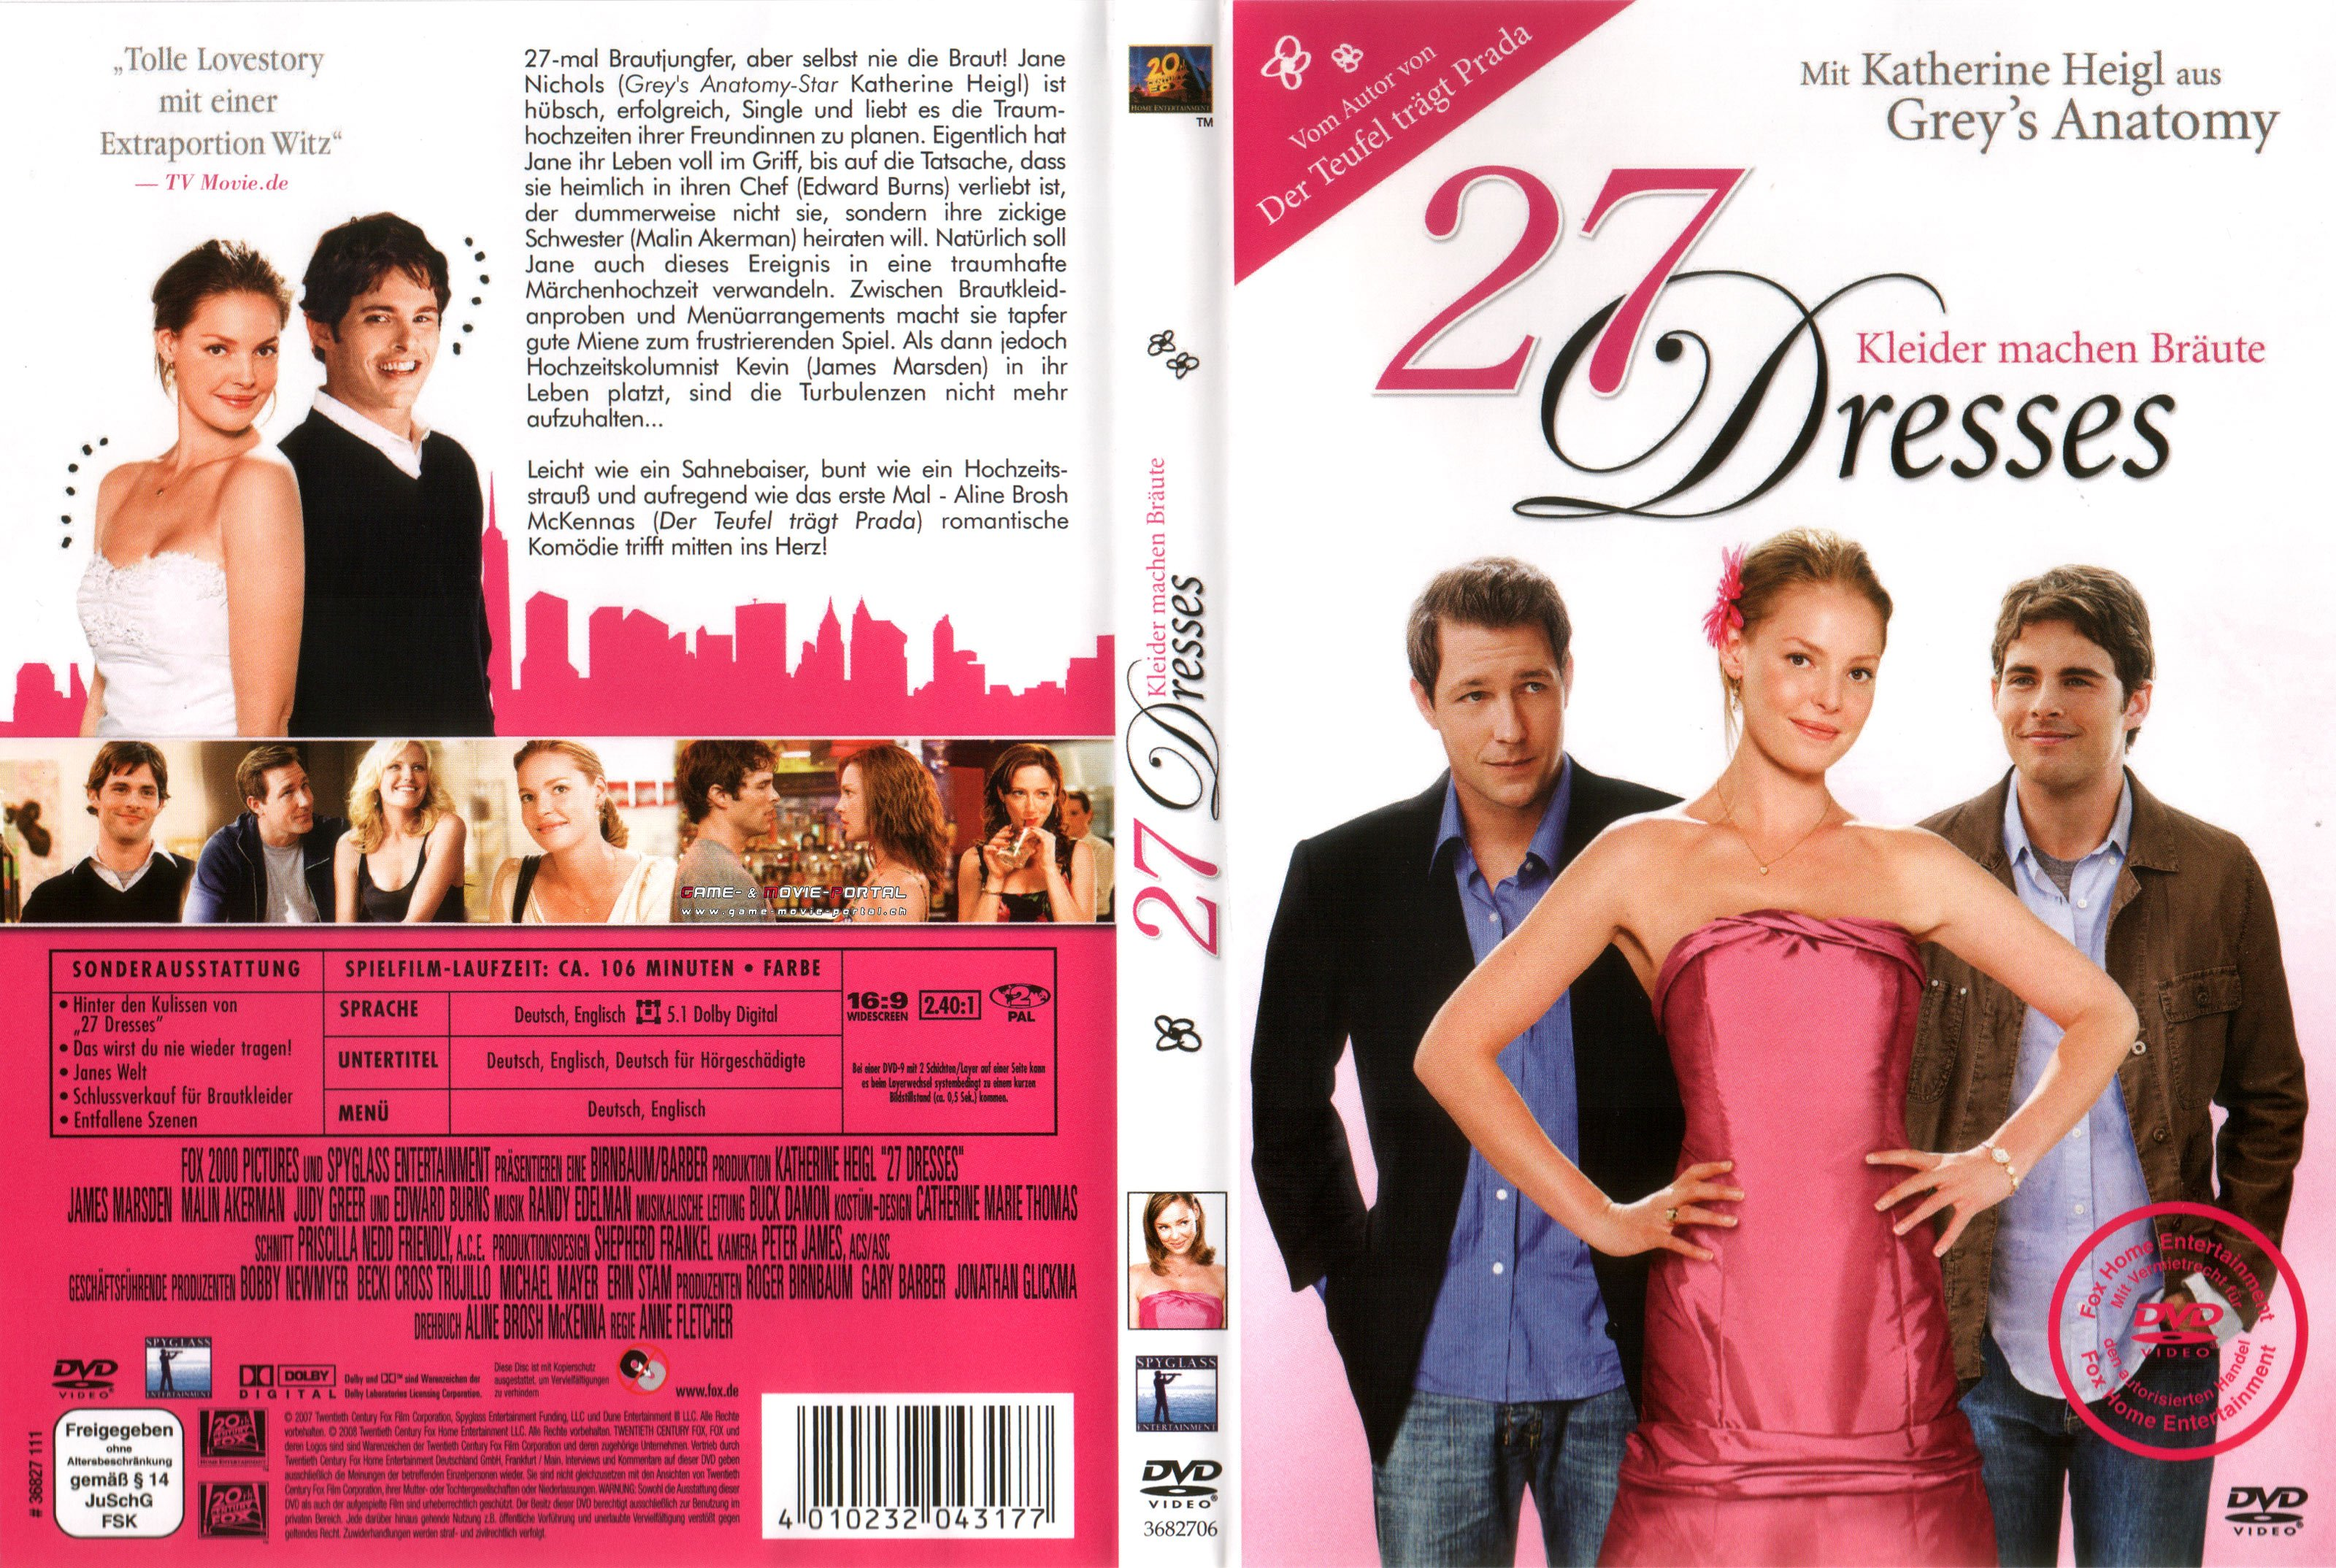 27 dresses 2008 imdb 27 dresses 2008 imdb 27 dresses cover